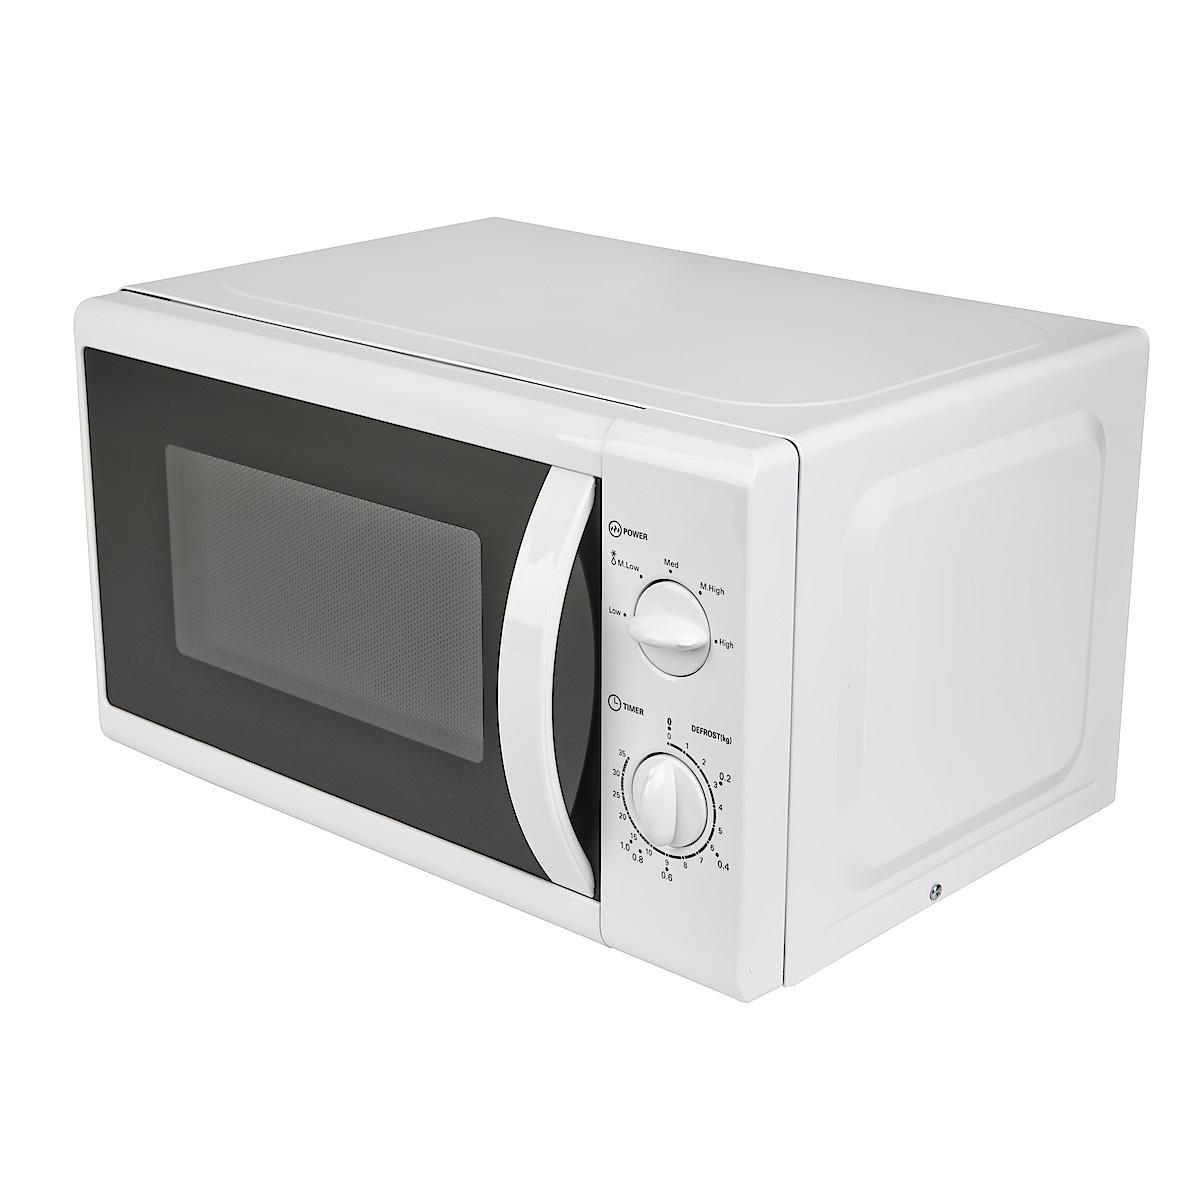 Mikrovågsugn vit